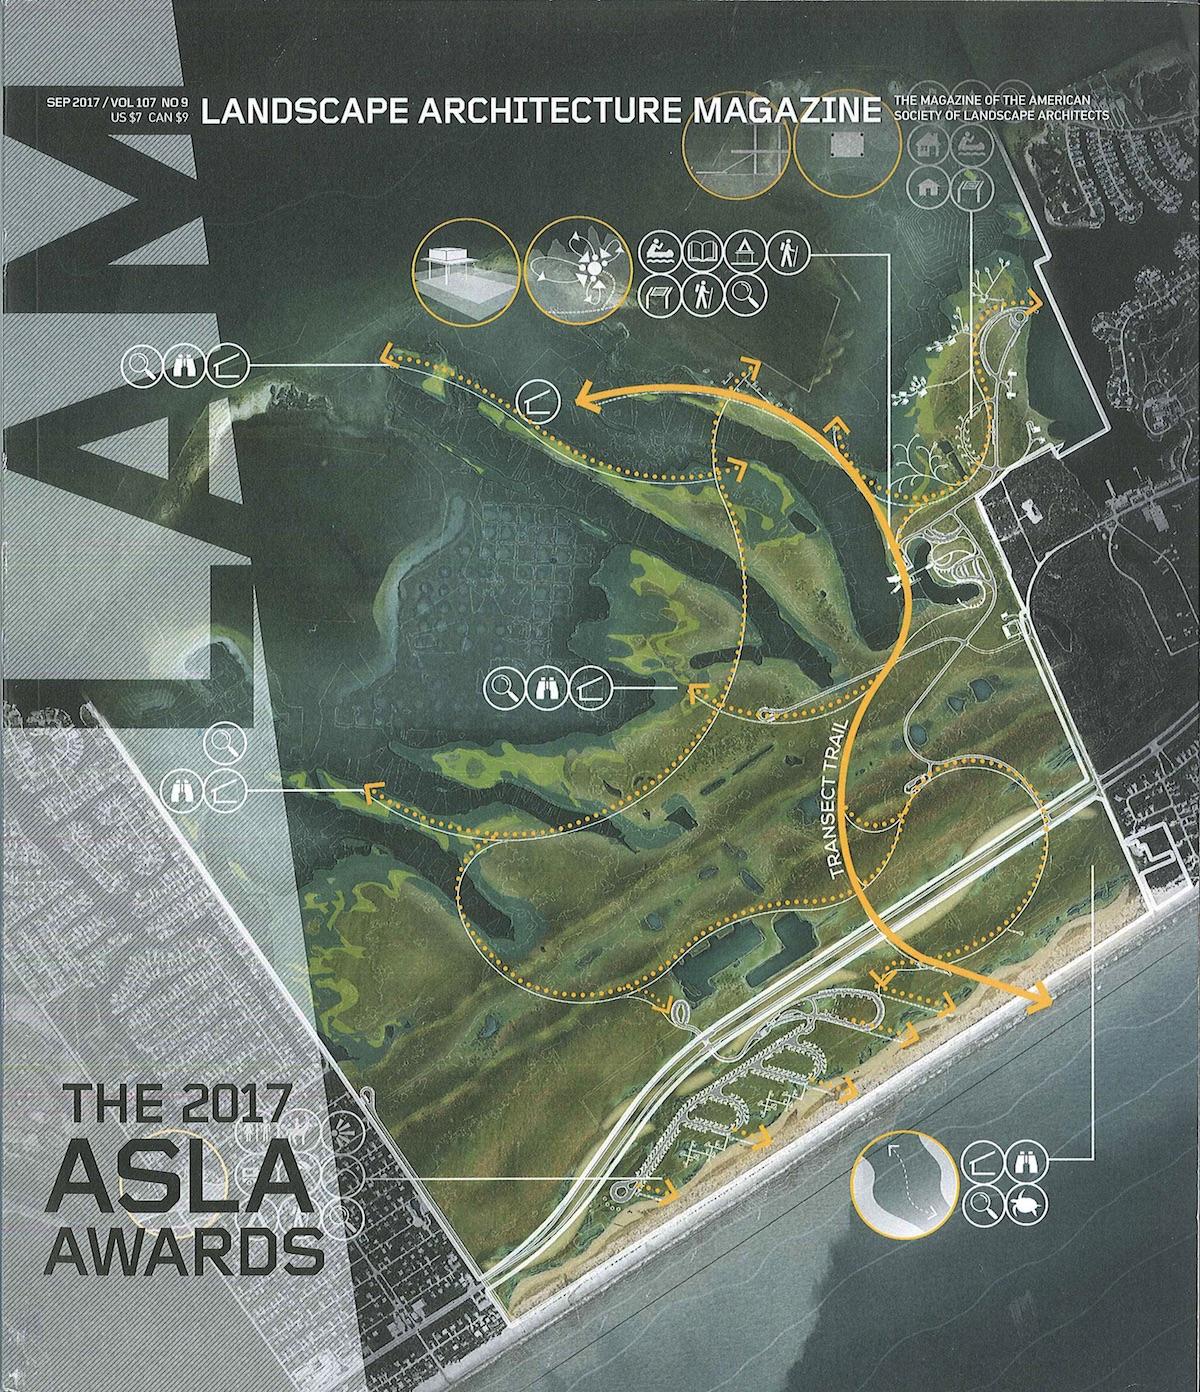 asla-award-cover.jpg